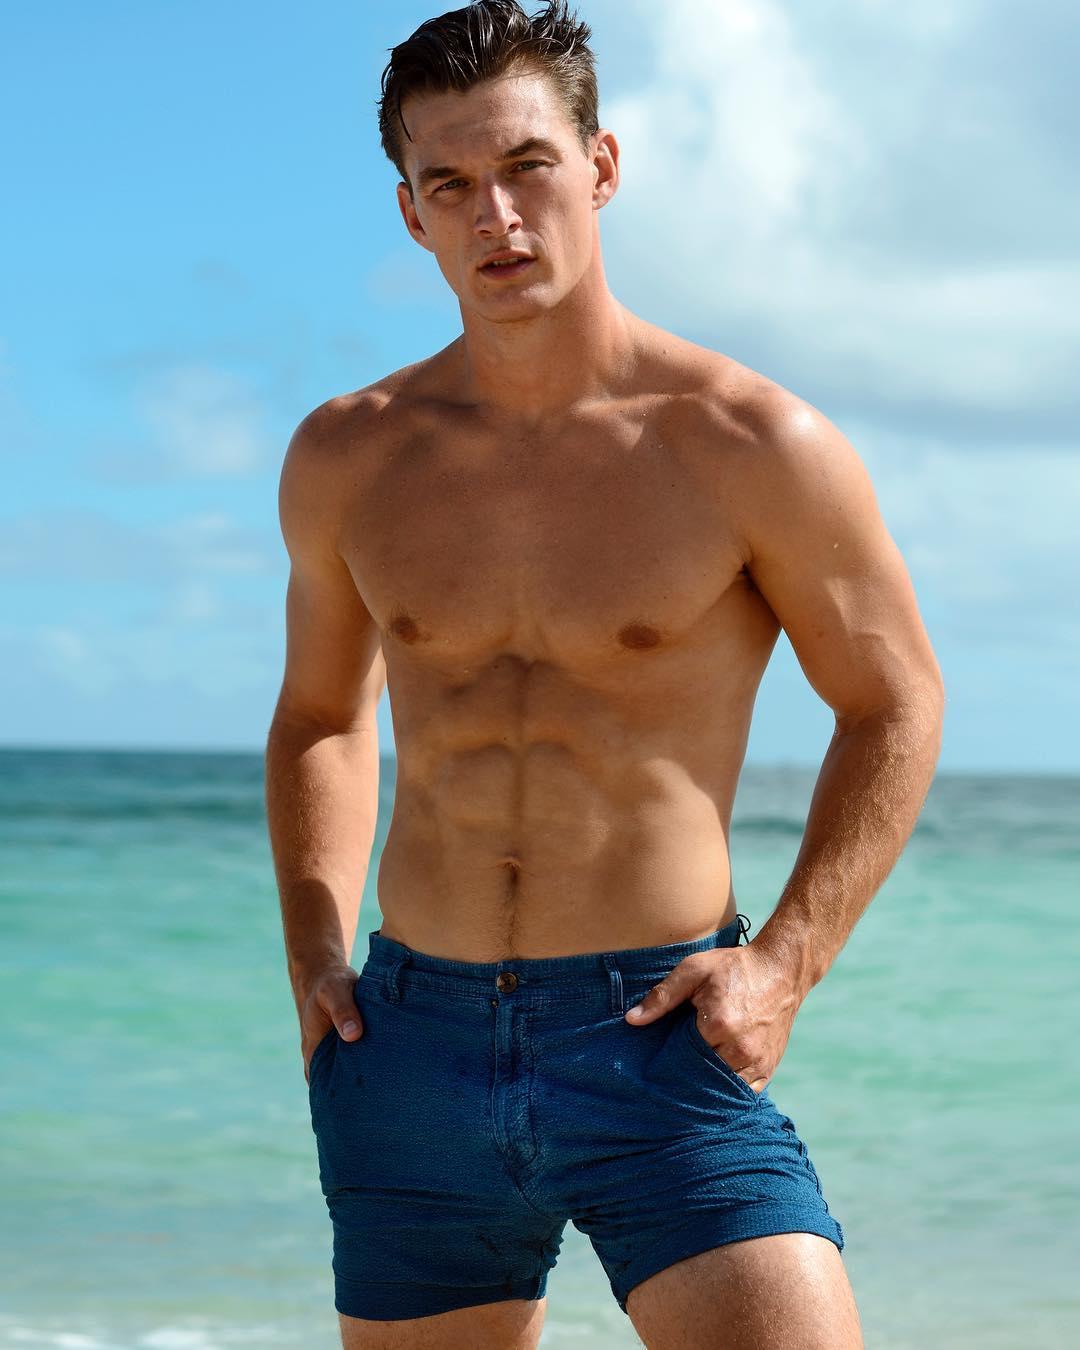 The Bachelorette's Tyler Cameron